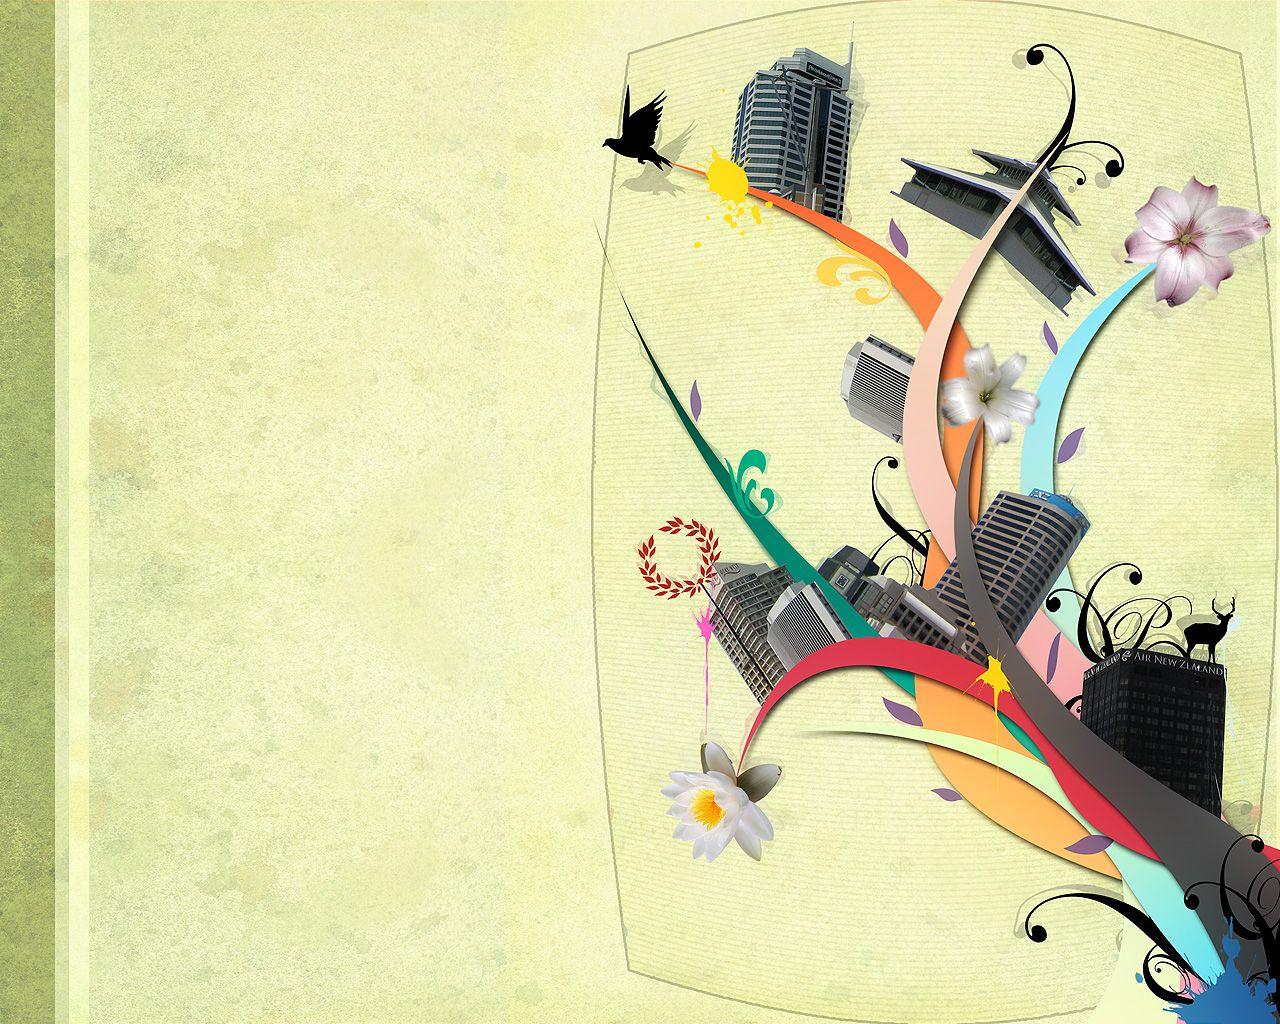 Big City Wallpaper By Sourcake On Deviantart City Wallpaper Colorful Animals Wallpaper